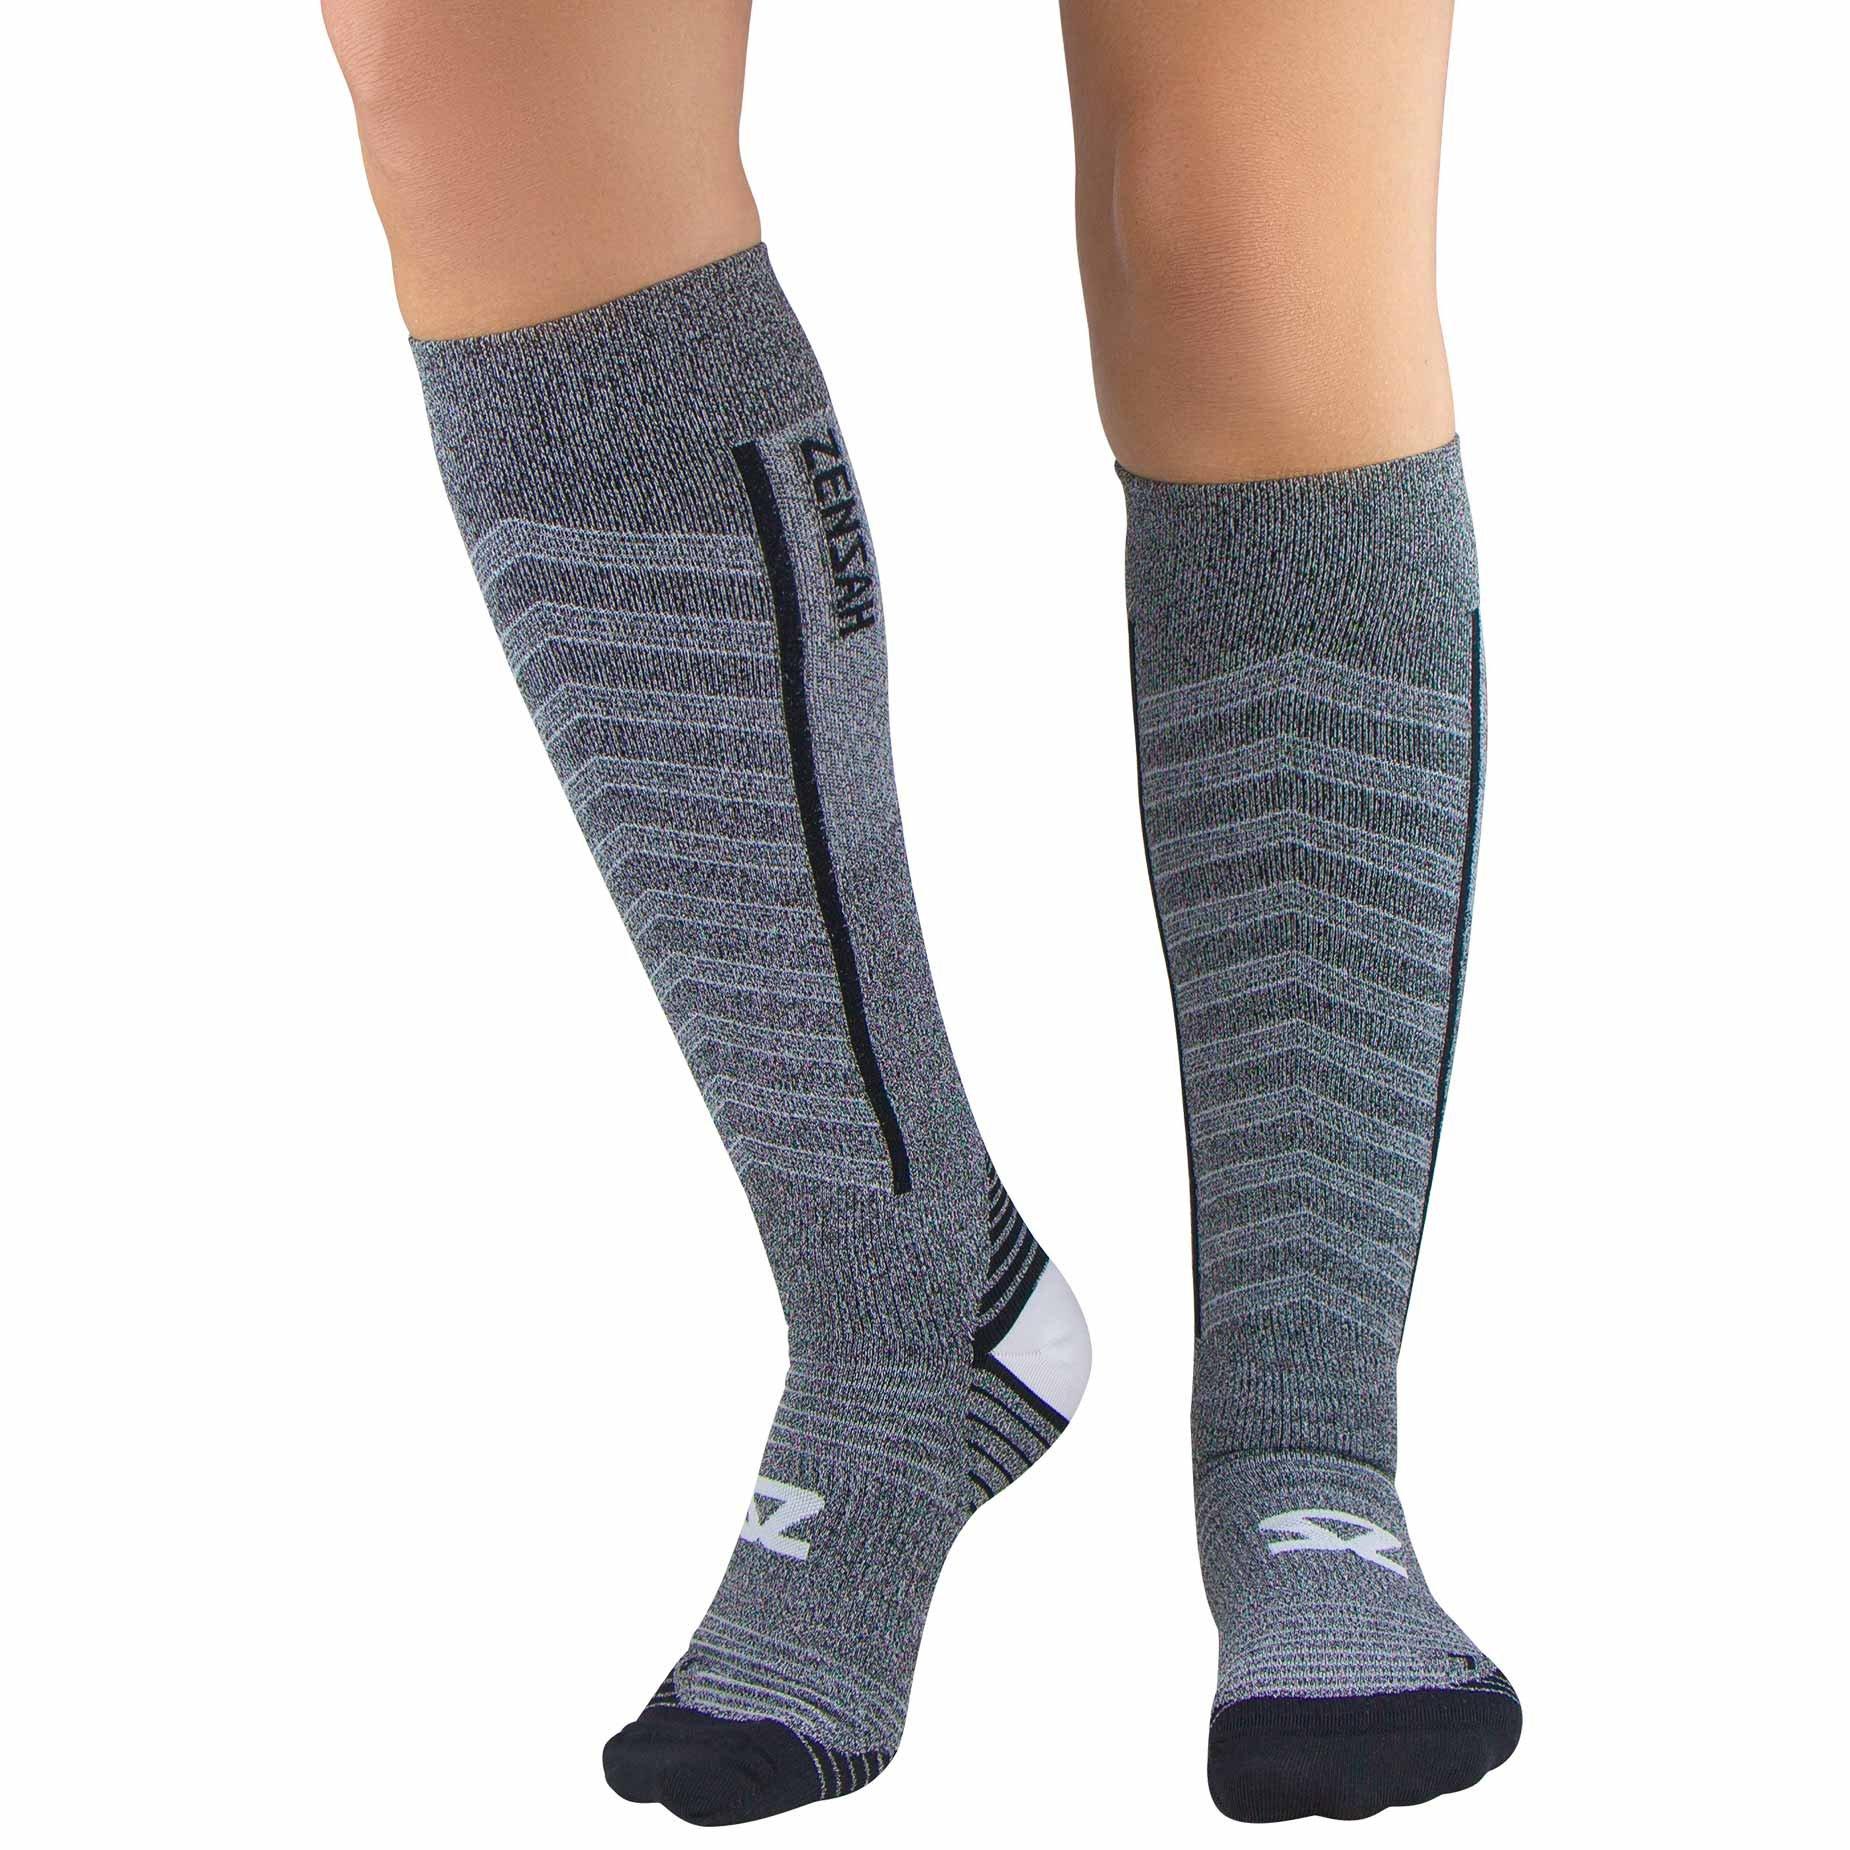 Zensah Featherweight Compression Socks - Ultra-Lightweight Compression Socks - Anti-blister, Graduated Compression (M, Heather Grey)